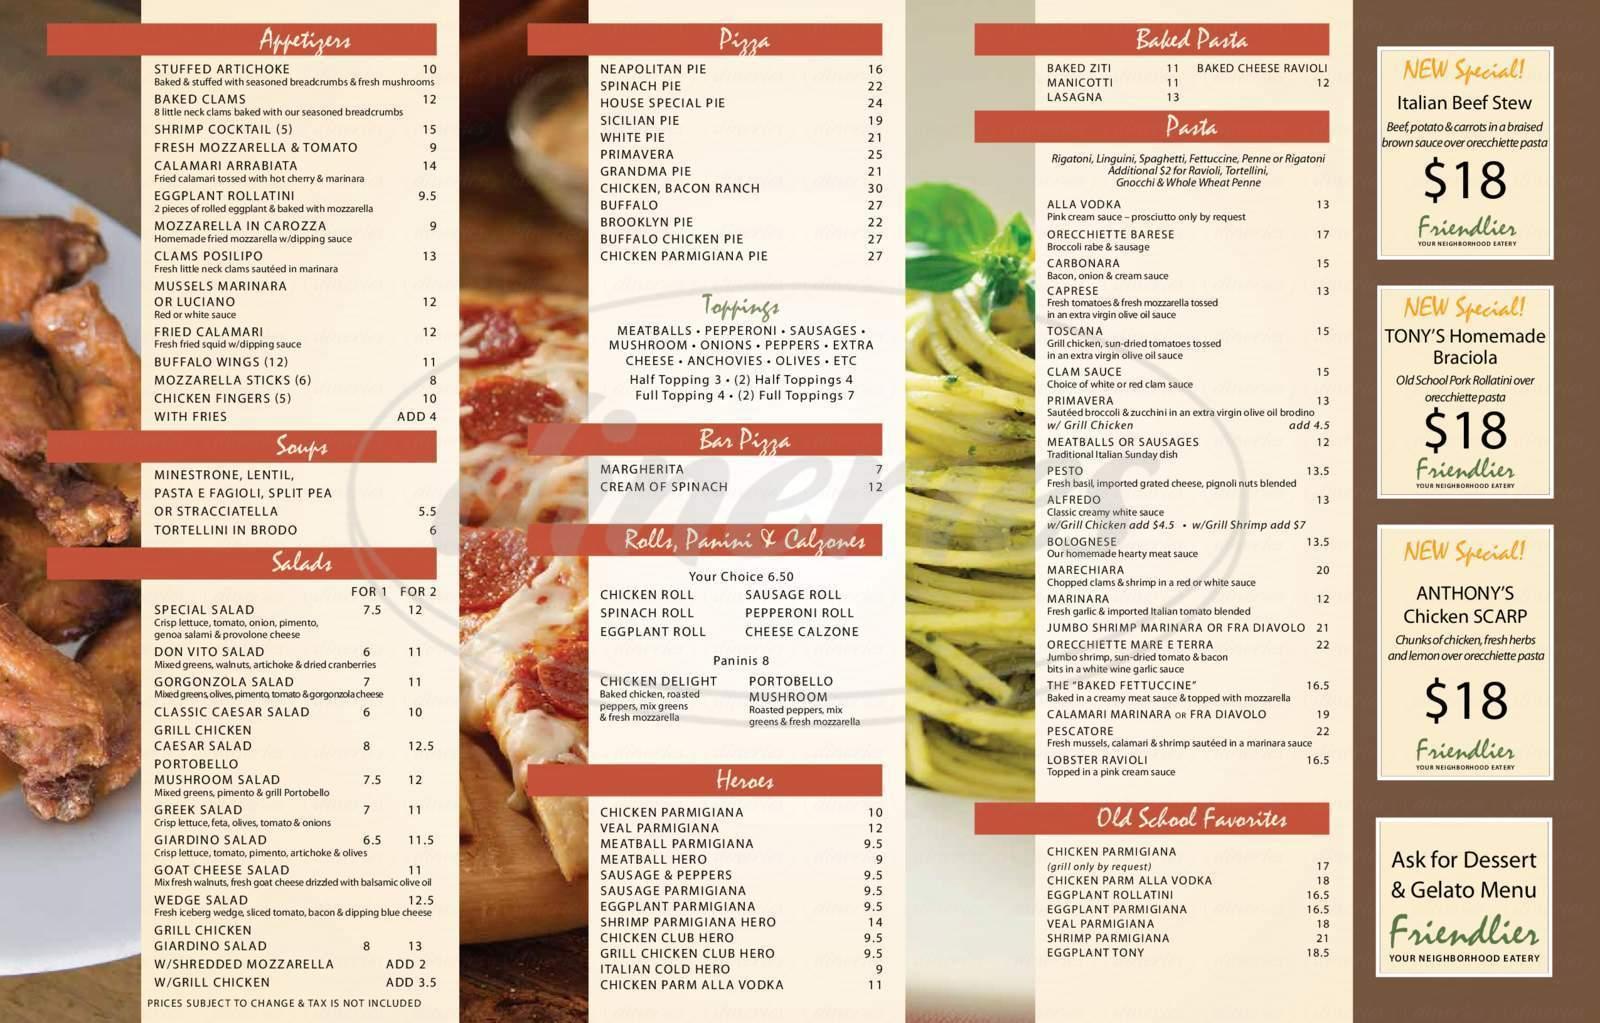 menu for Friendlier Restaurant & Pizzeria